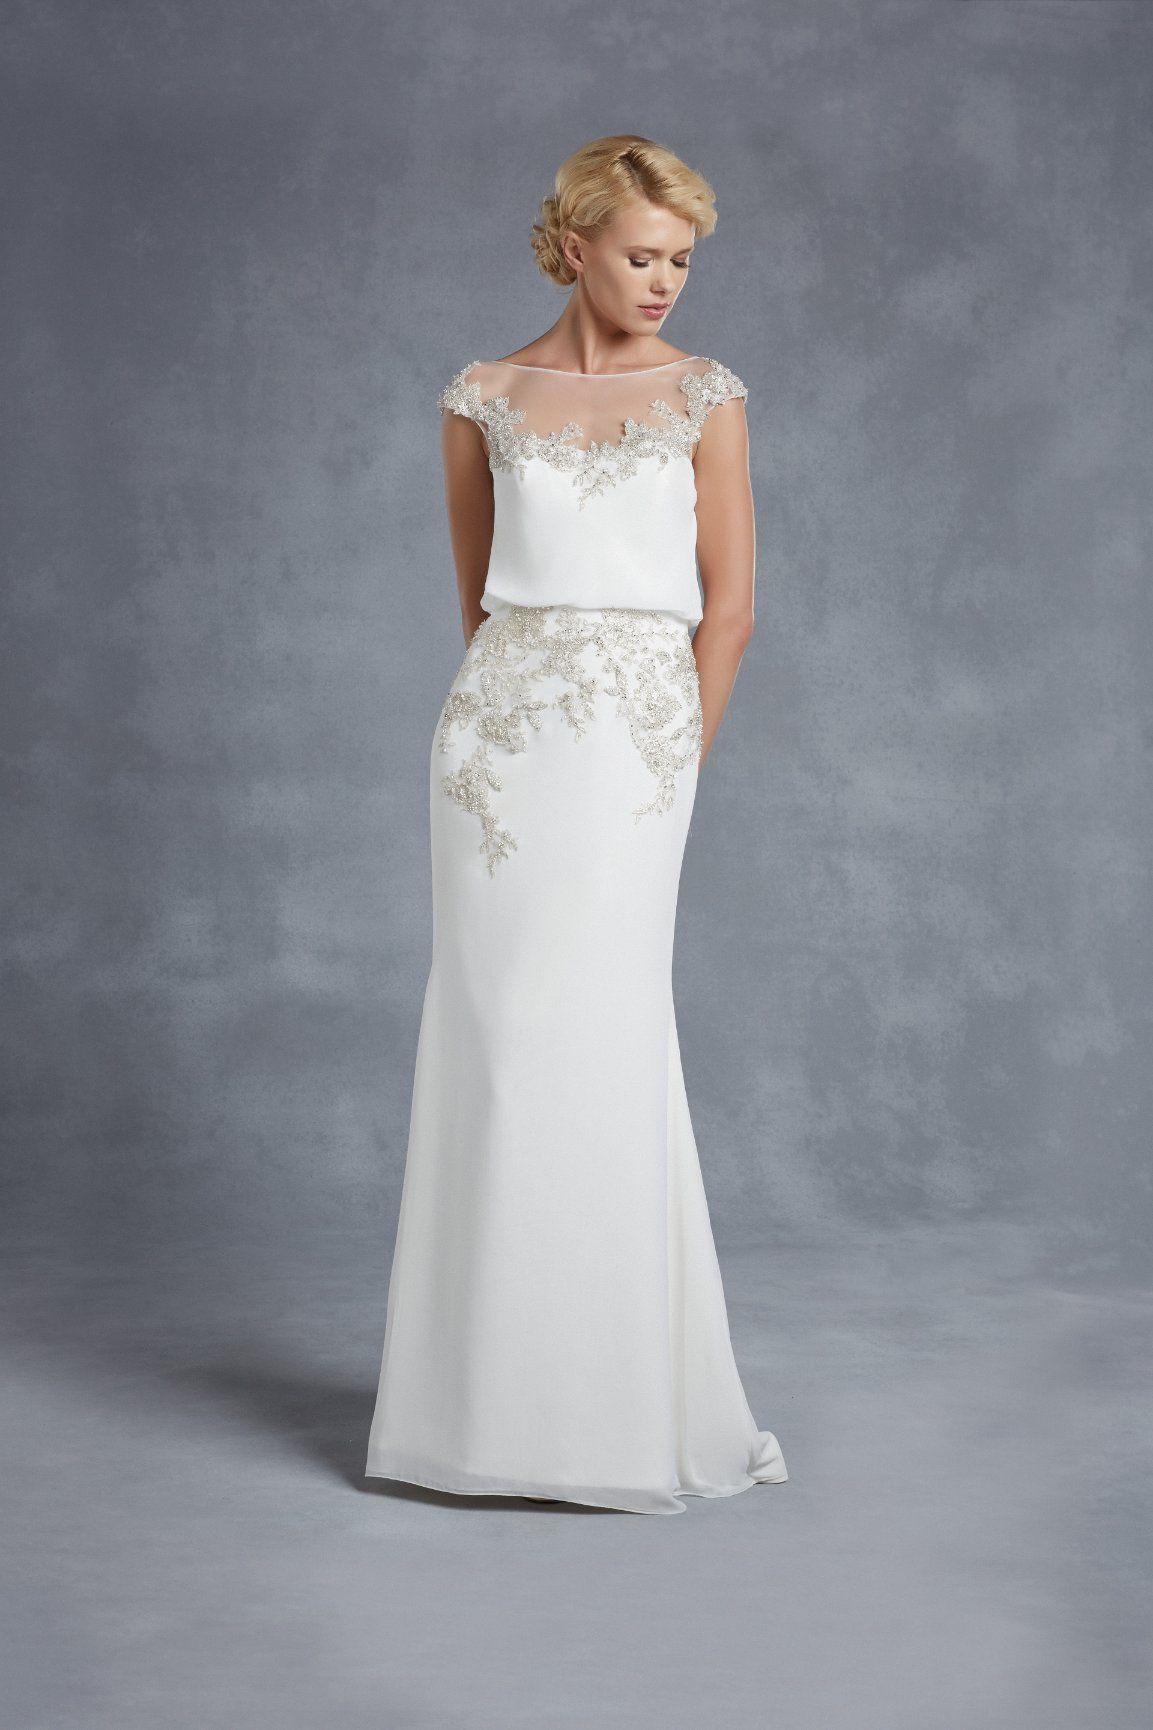 Blue by Enzoani Harlem | Enzoani | Pinterest | Wedding dress ...